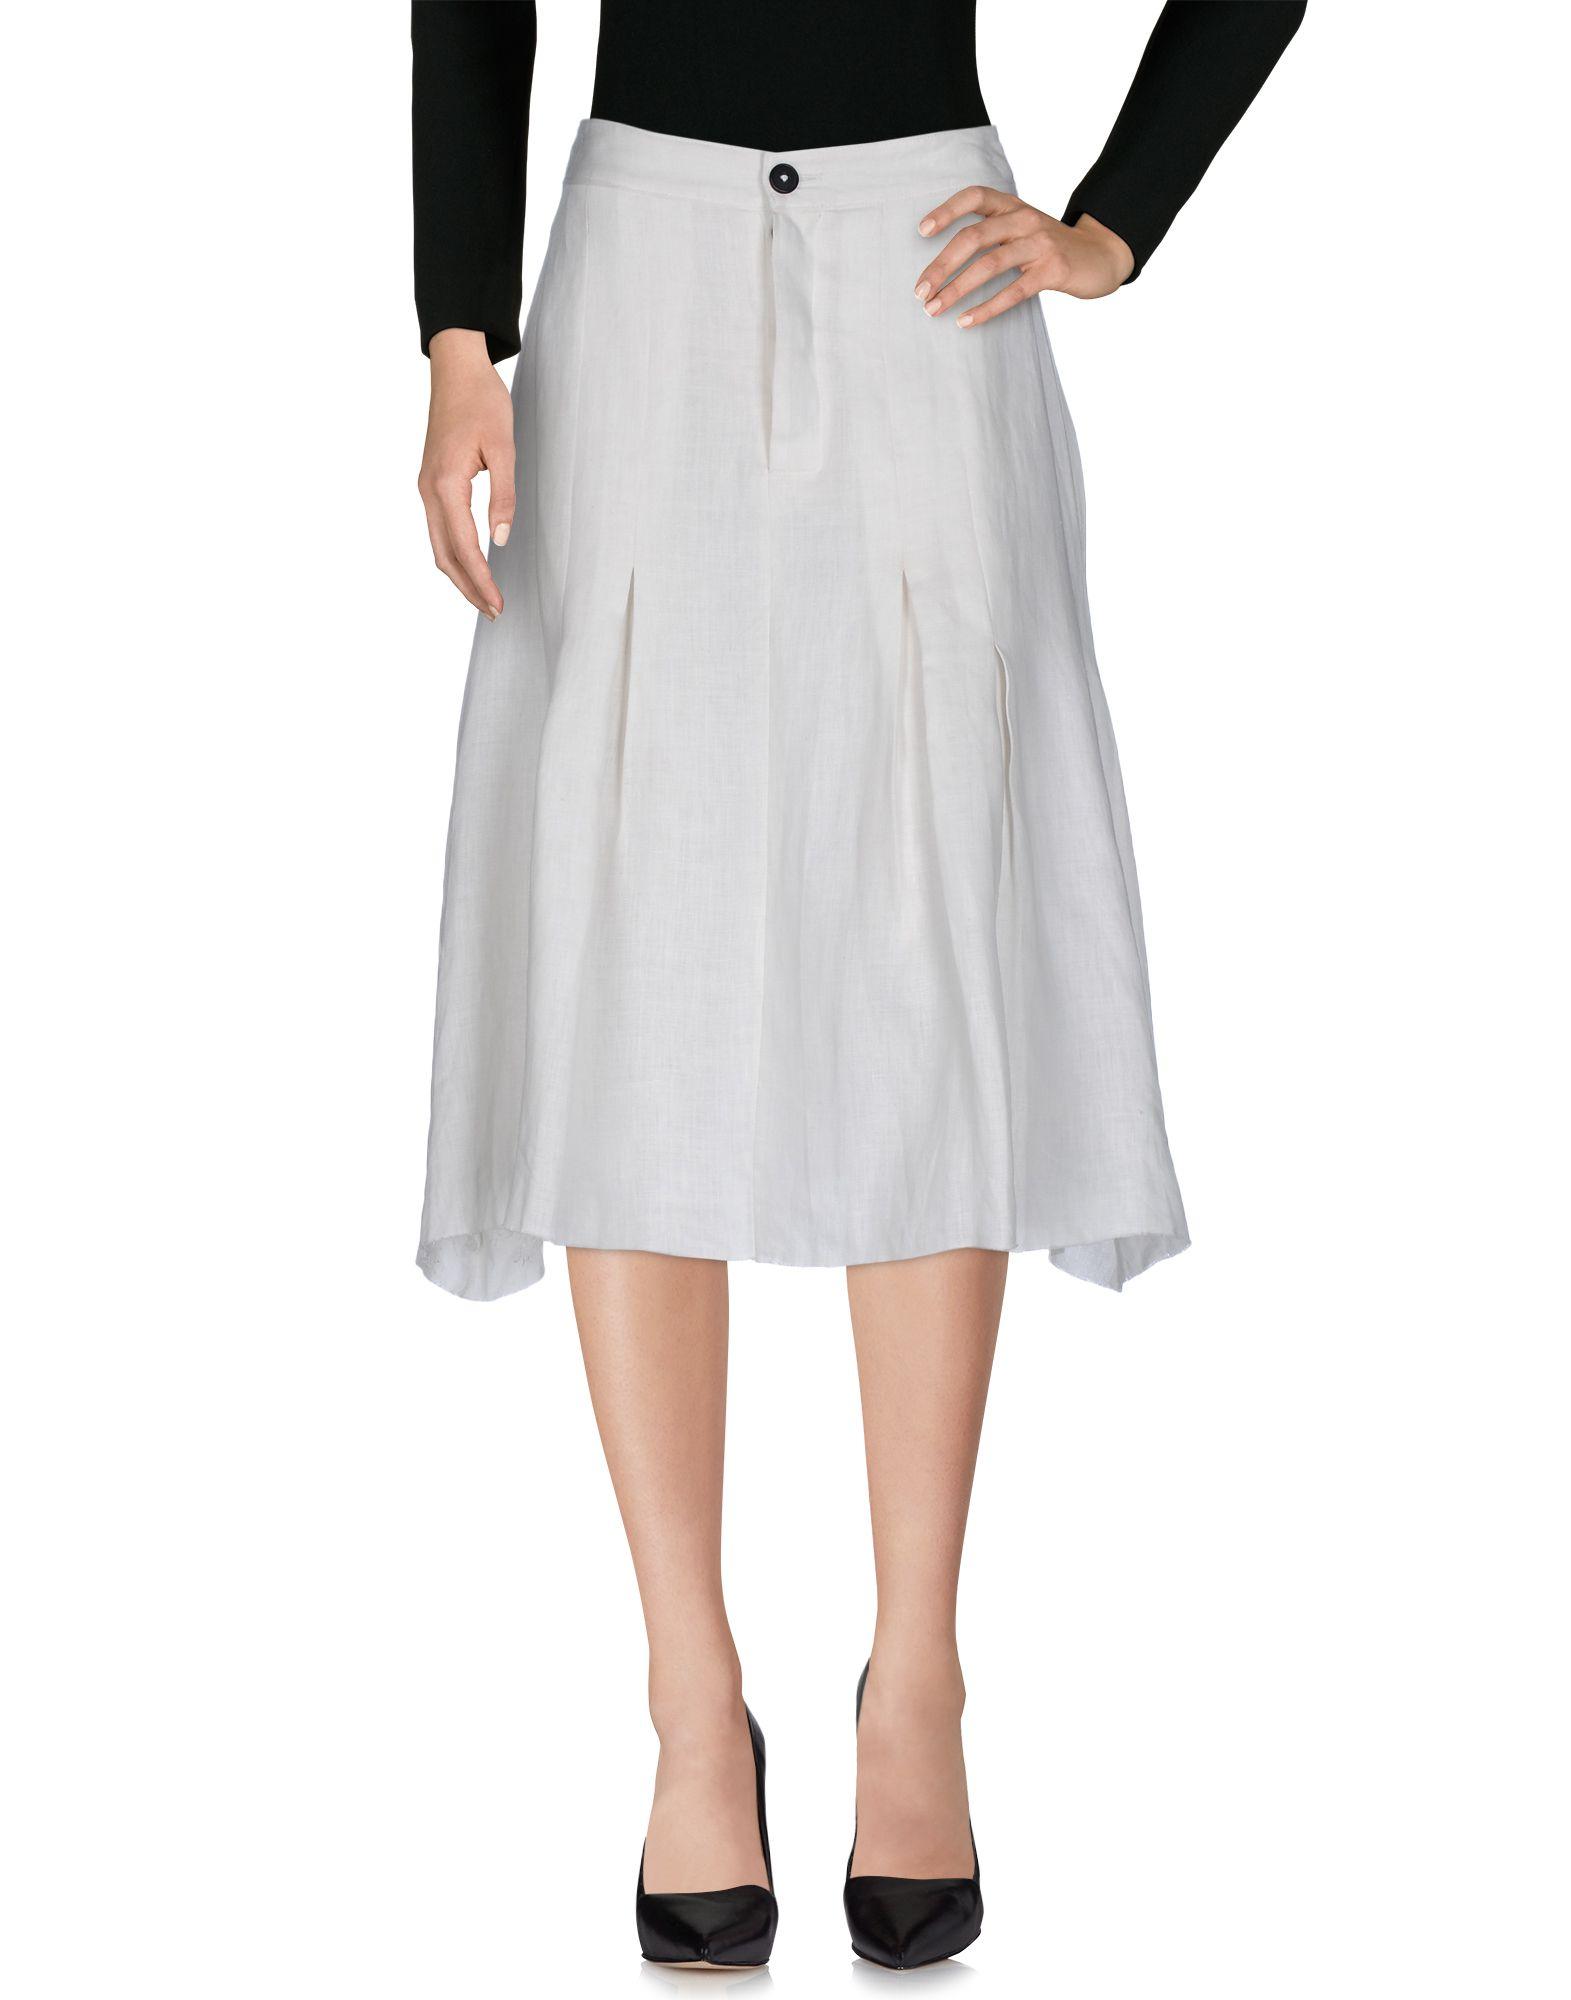 A TENTATIVE ATELIER Damen Midirock Farbe Weiß Größe 4